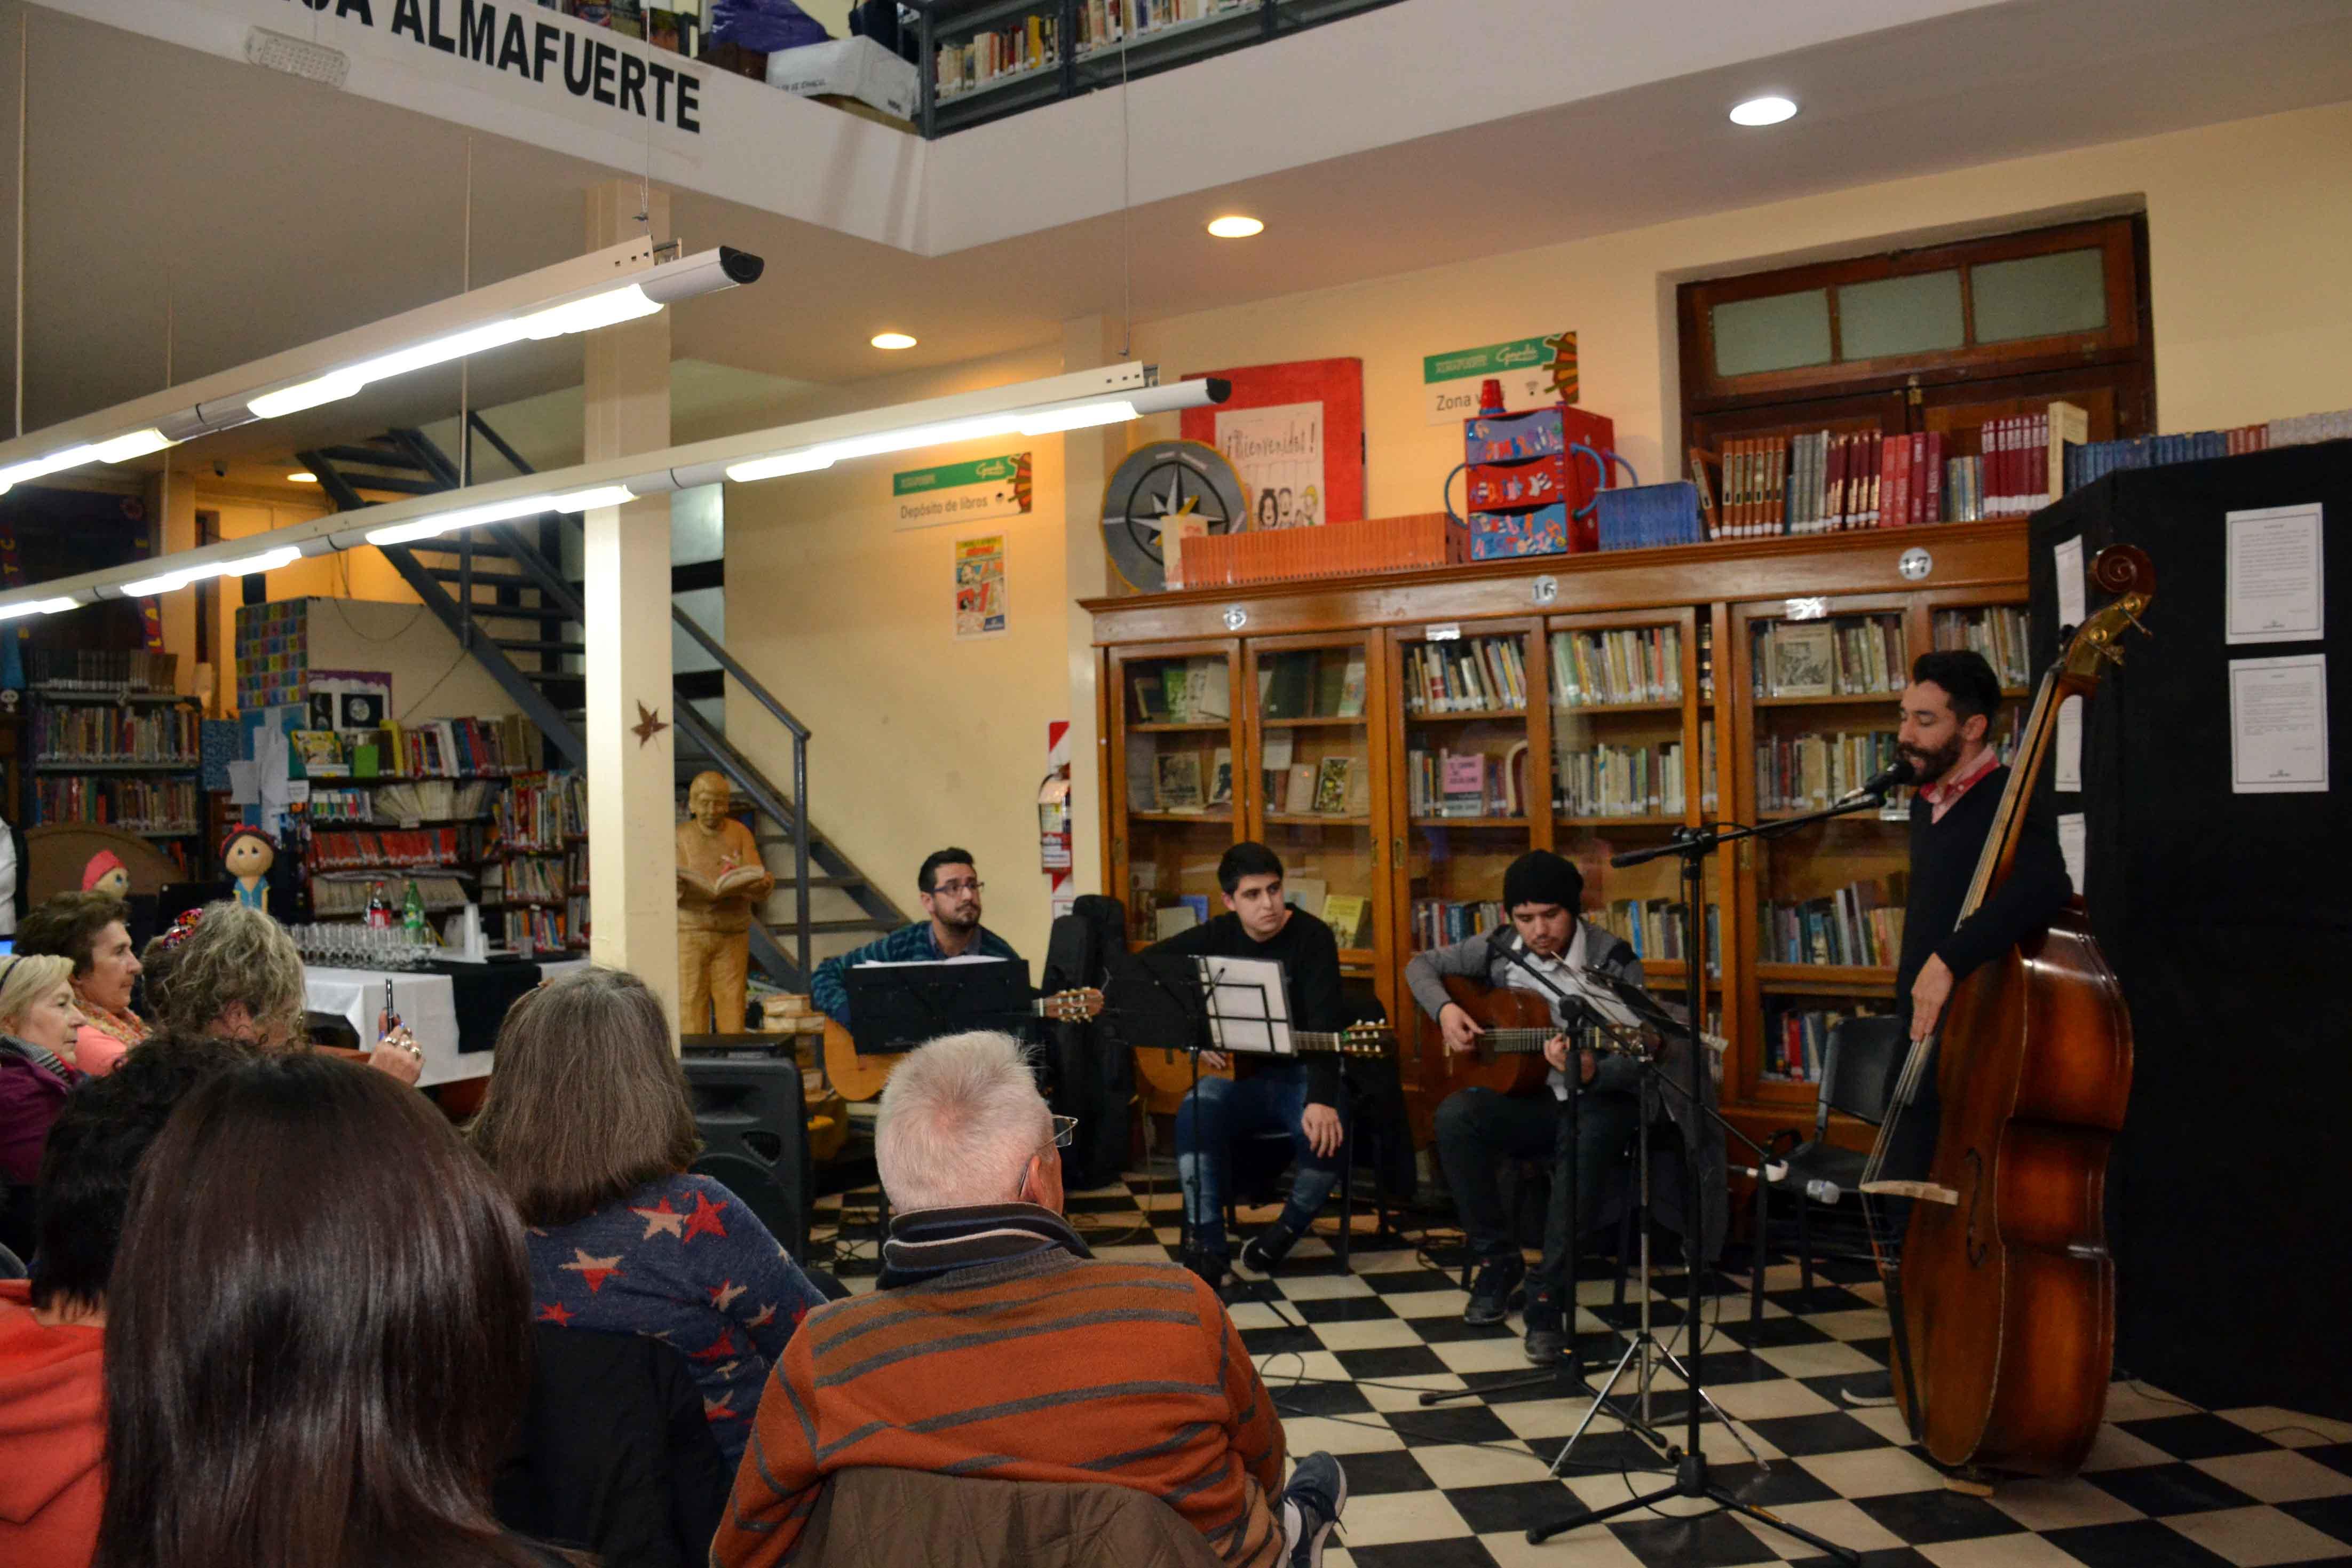 Encuentro de microrrelatos- Biblioteca Almafuerte (7)